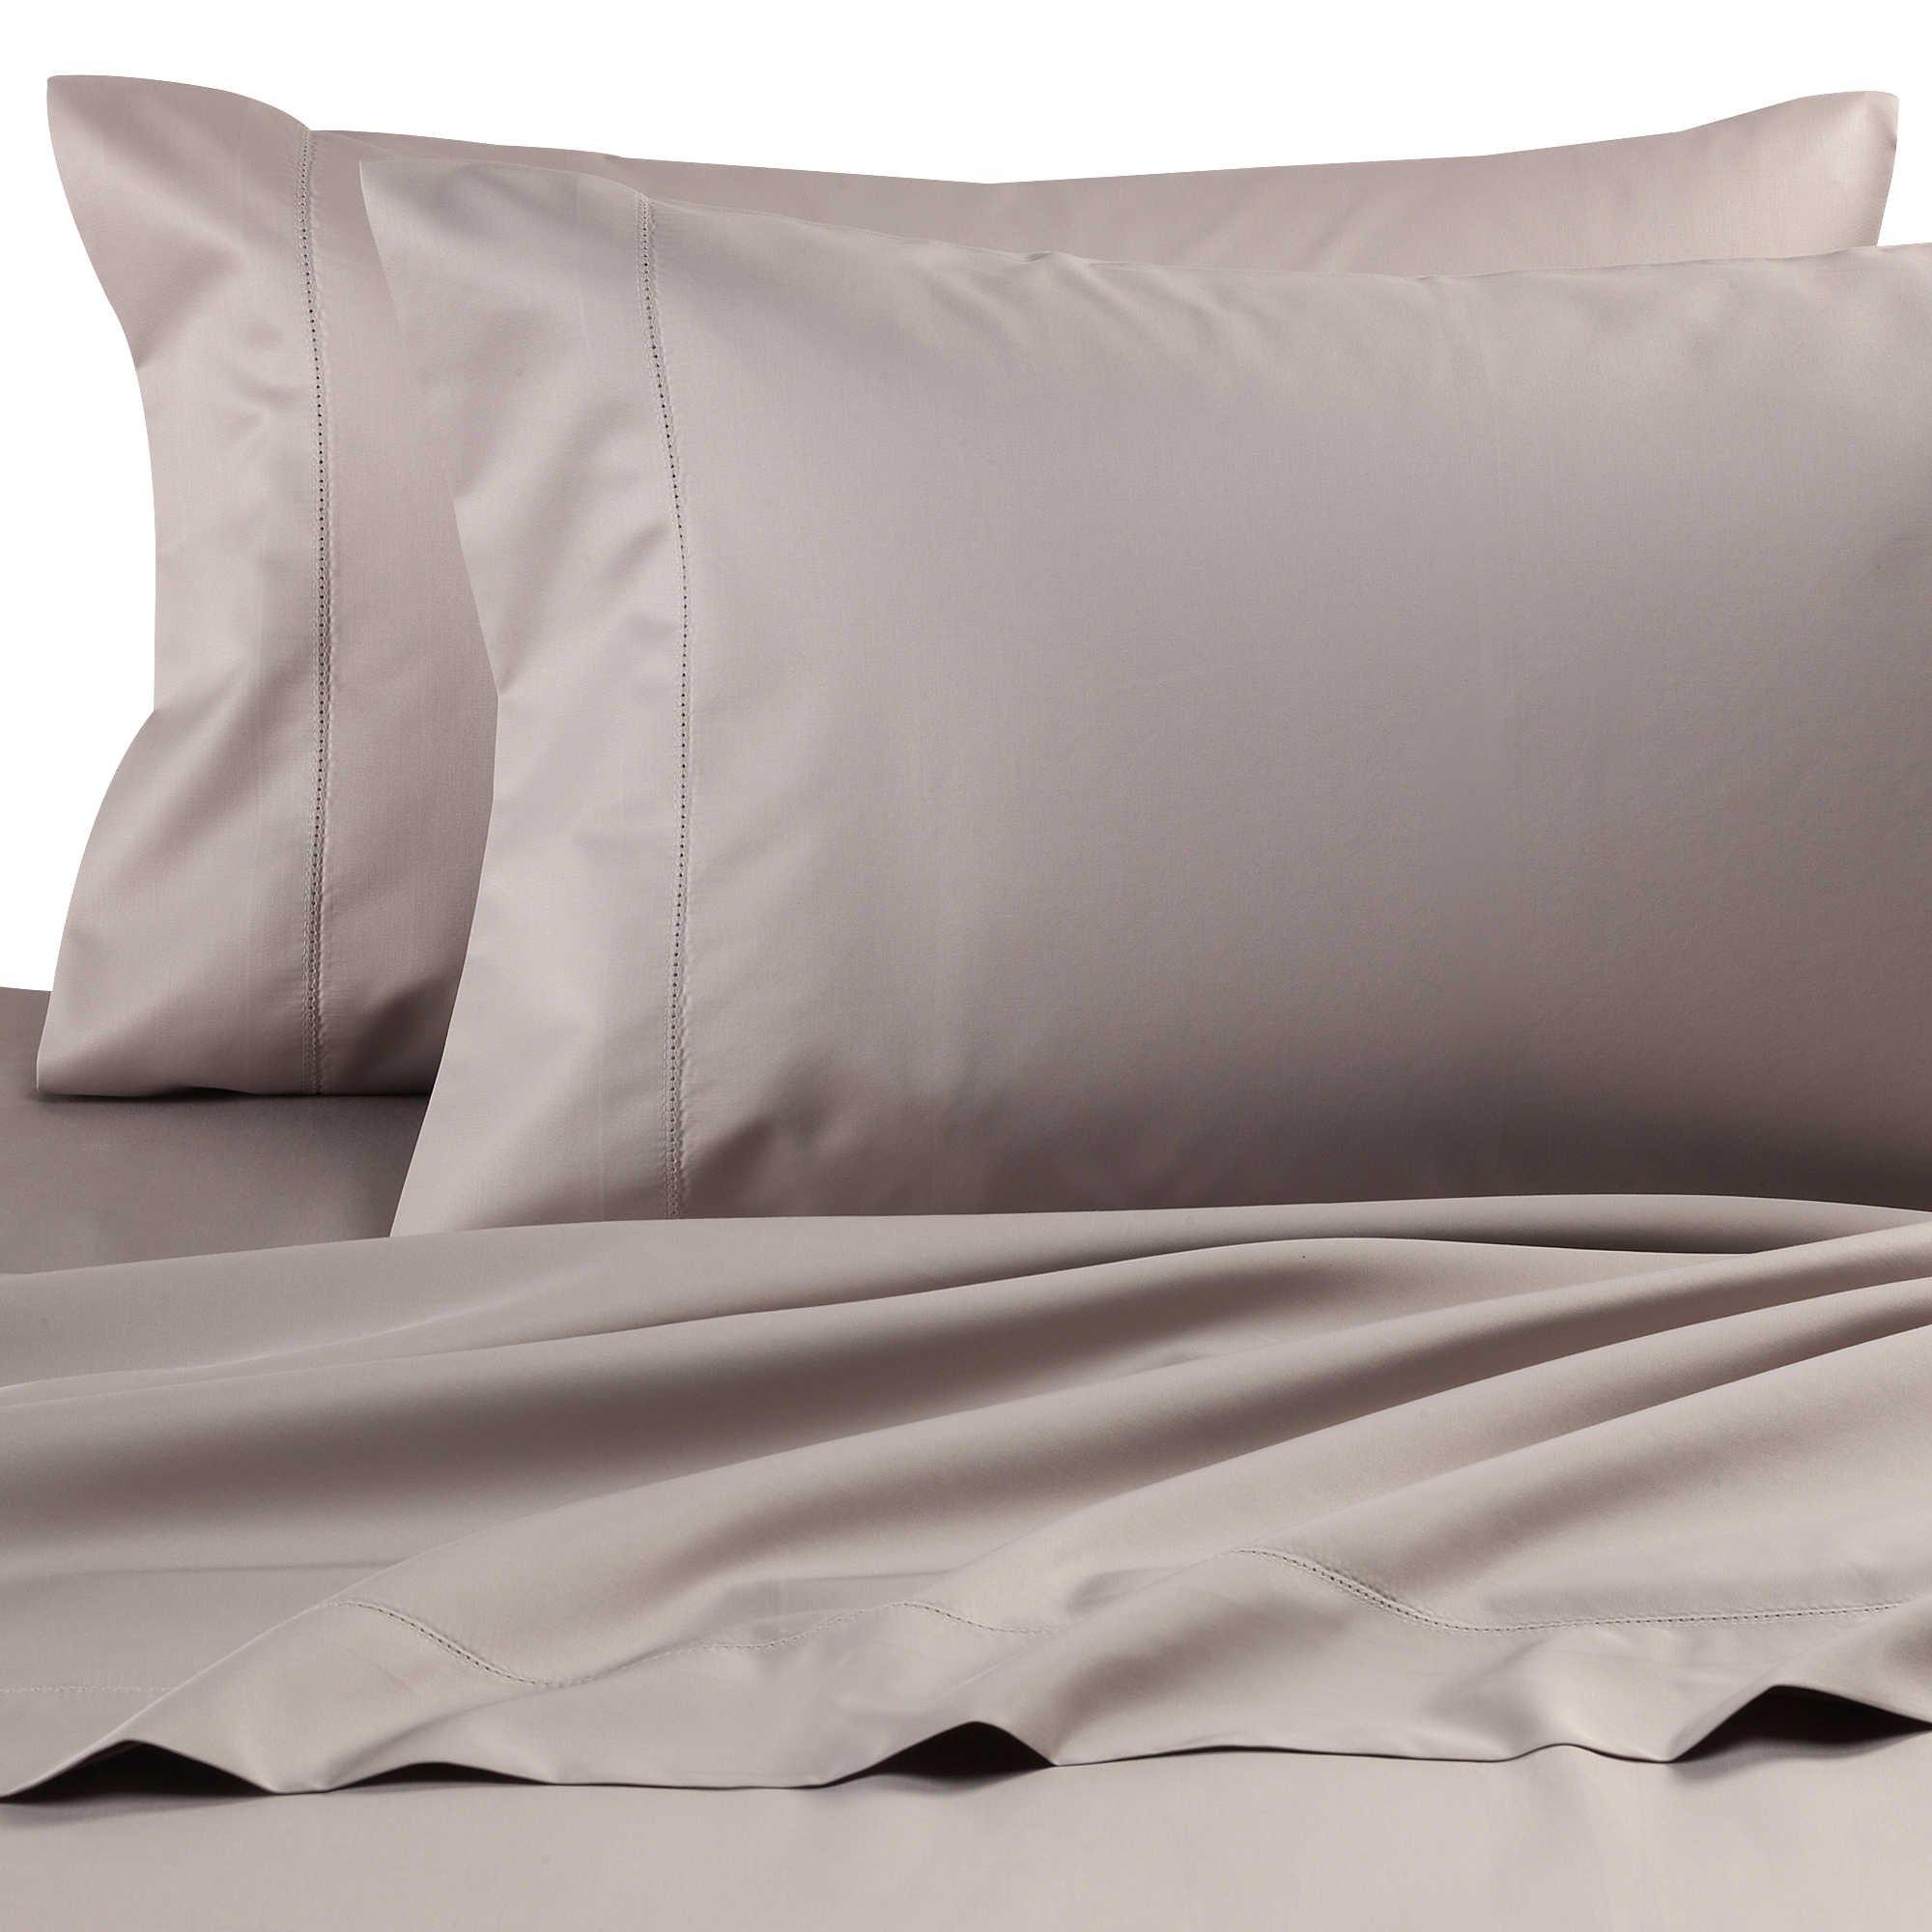 Wamsutta Dream Zone Grey Ashe King Sheet Set, 750 thread count